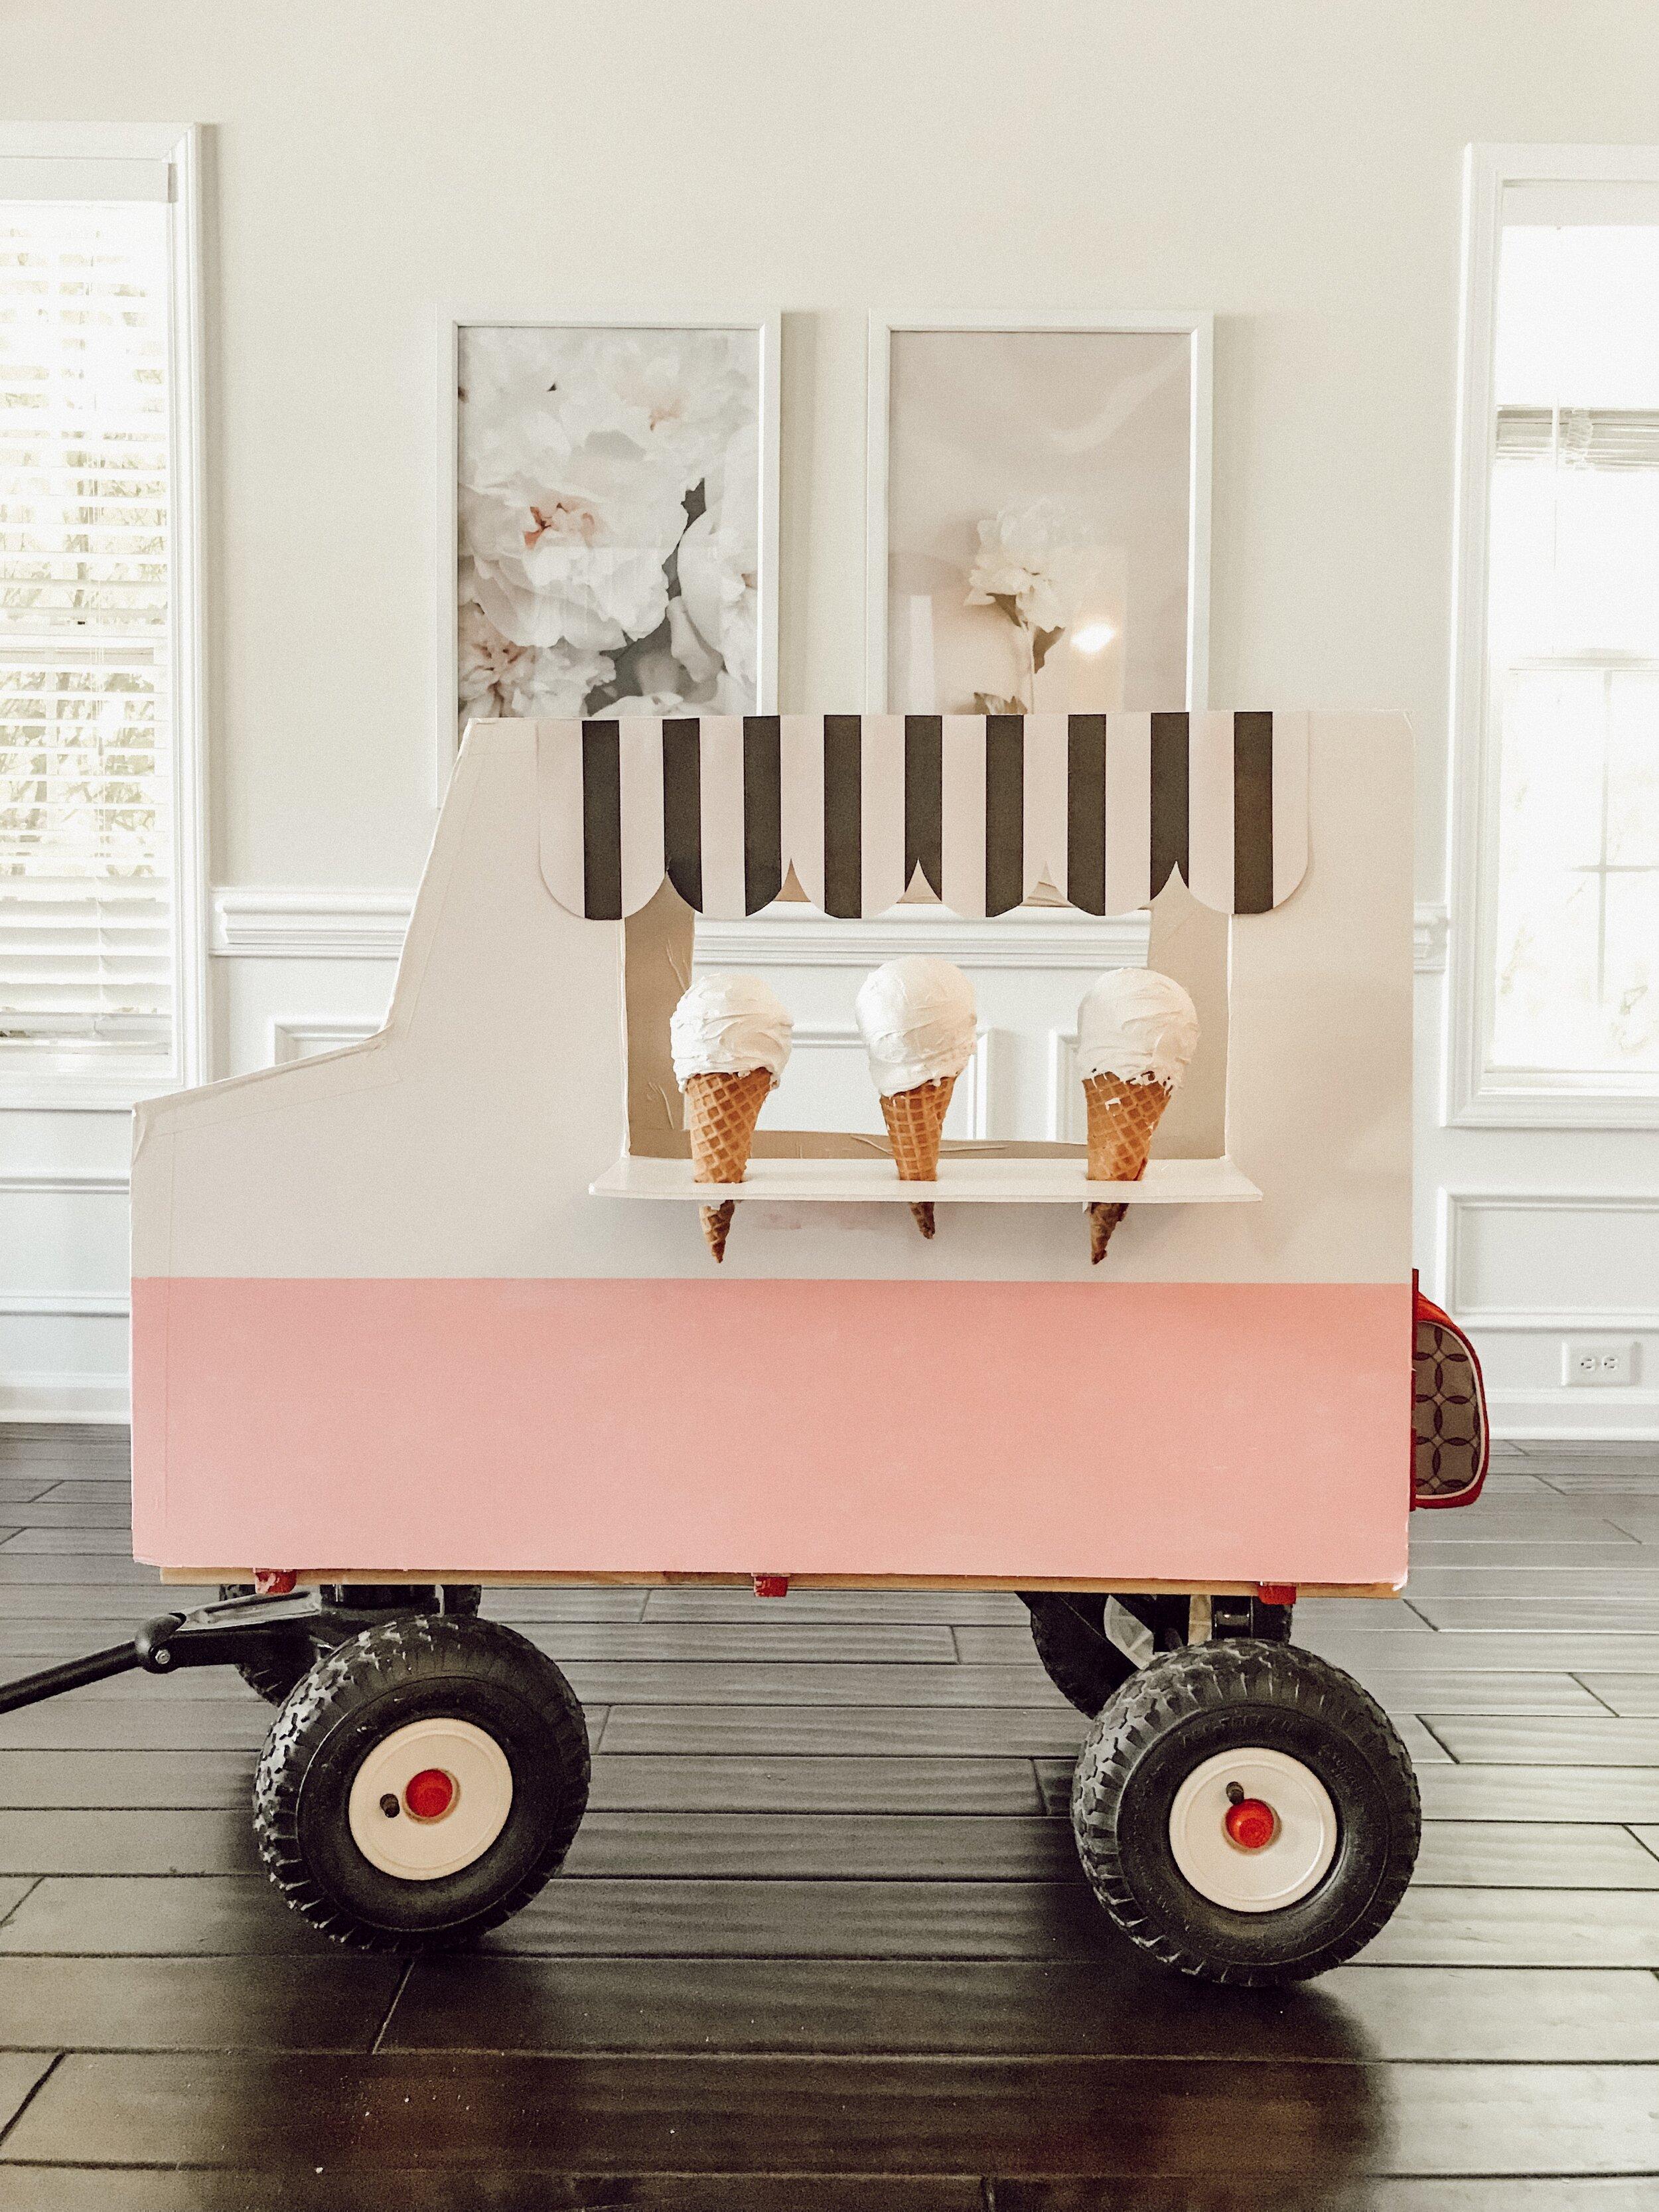 Diy Ice Cream Truck : cream, truck, Cream, Truck, Family, Halloween, Costume, Momma, Society